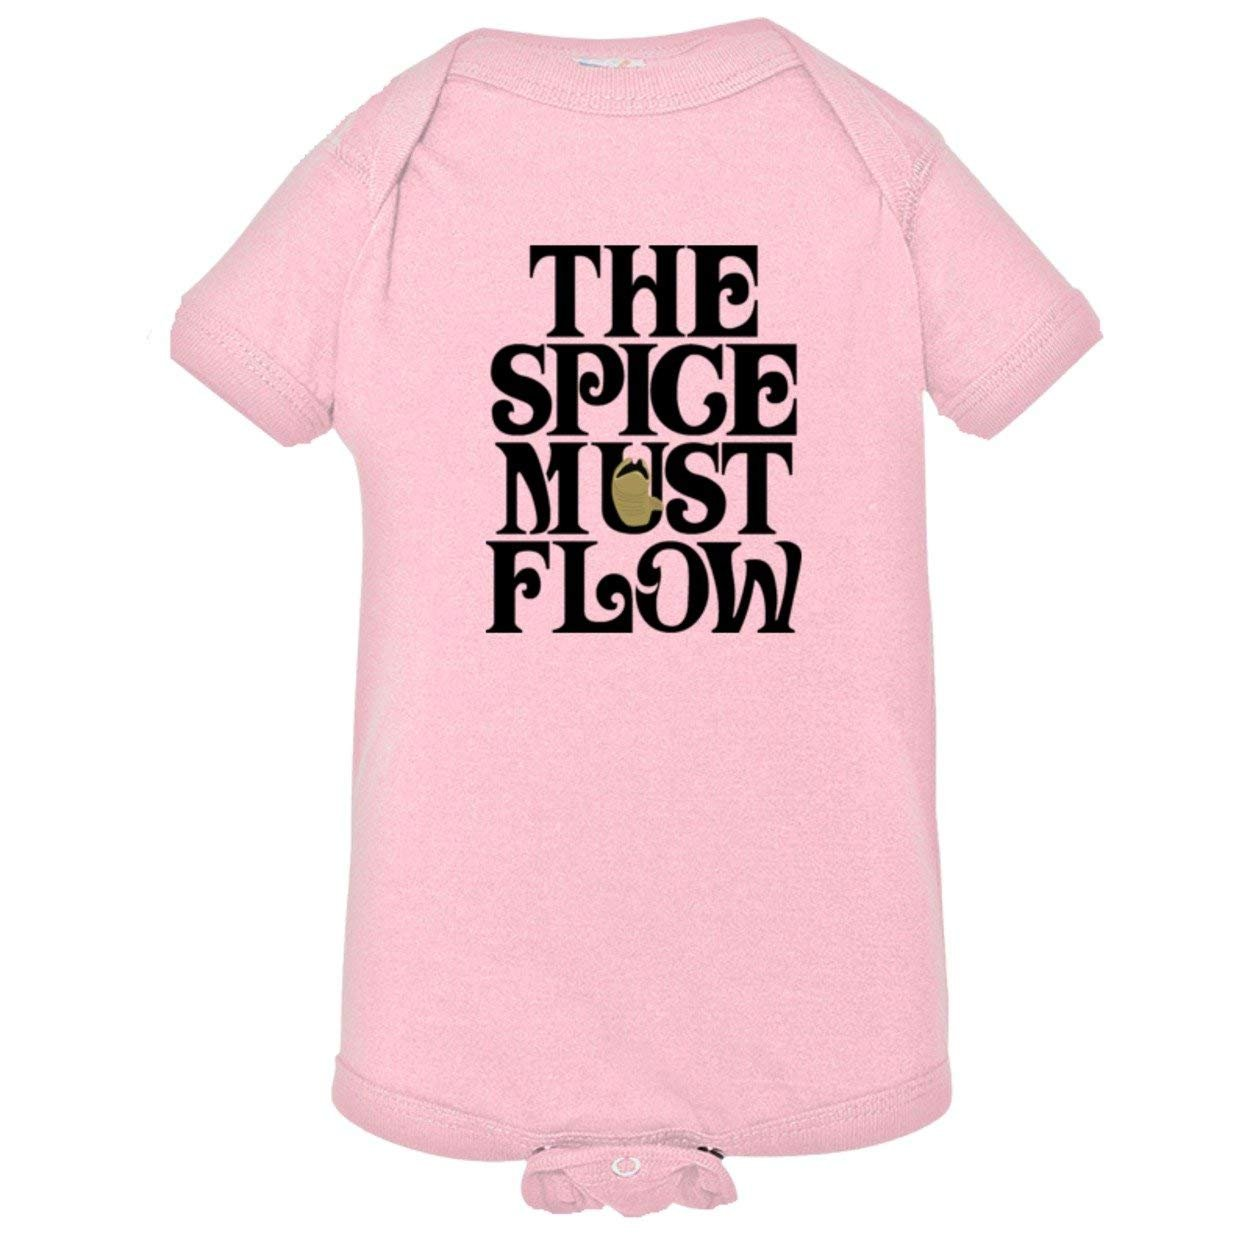 The Spice Must Flow Healthy Kids Kids Nutrition